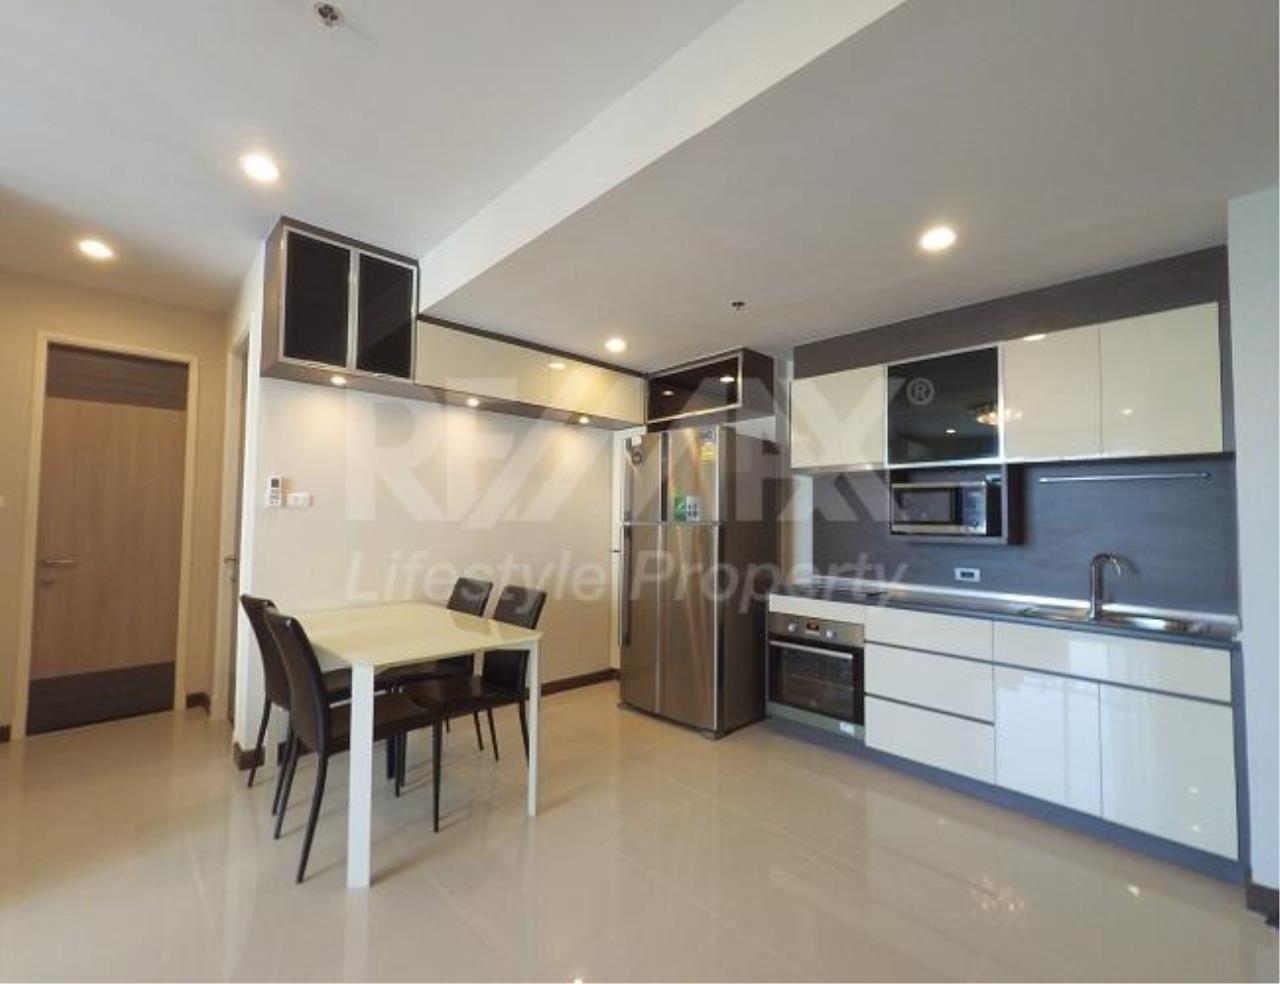 RE/MAX LifeStyle Property Agency's Supalai Premier @ Asoke 11